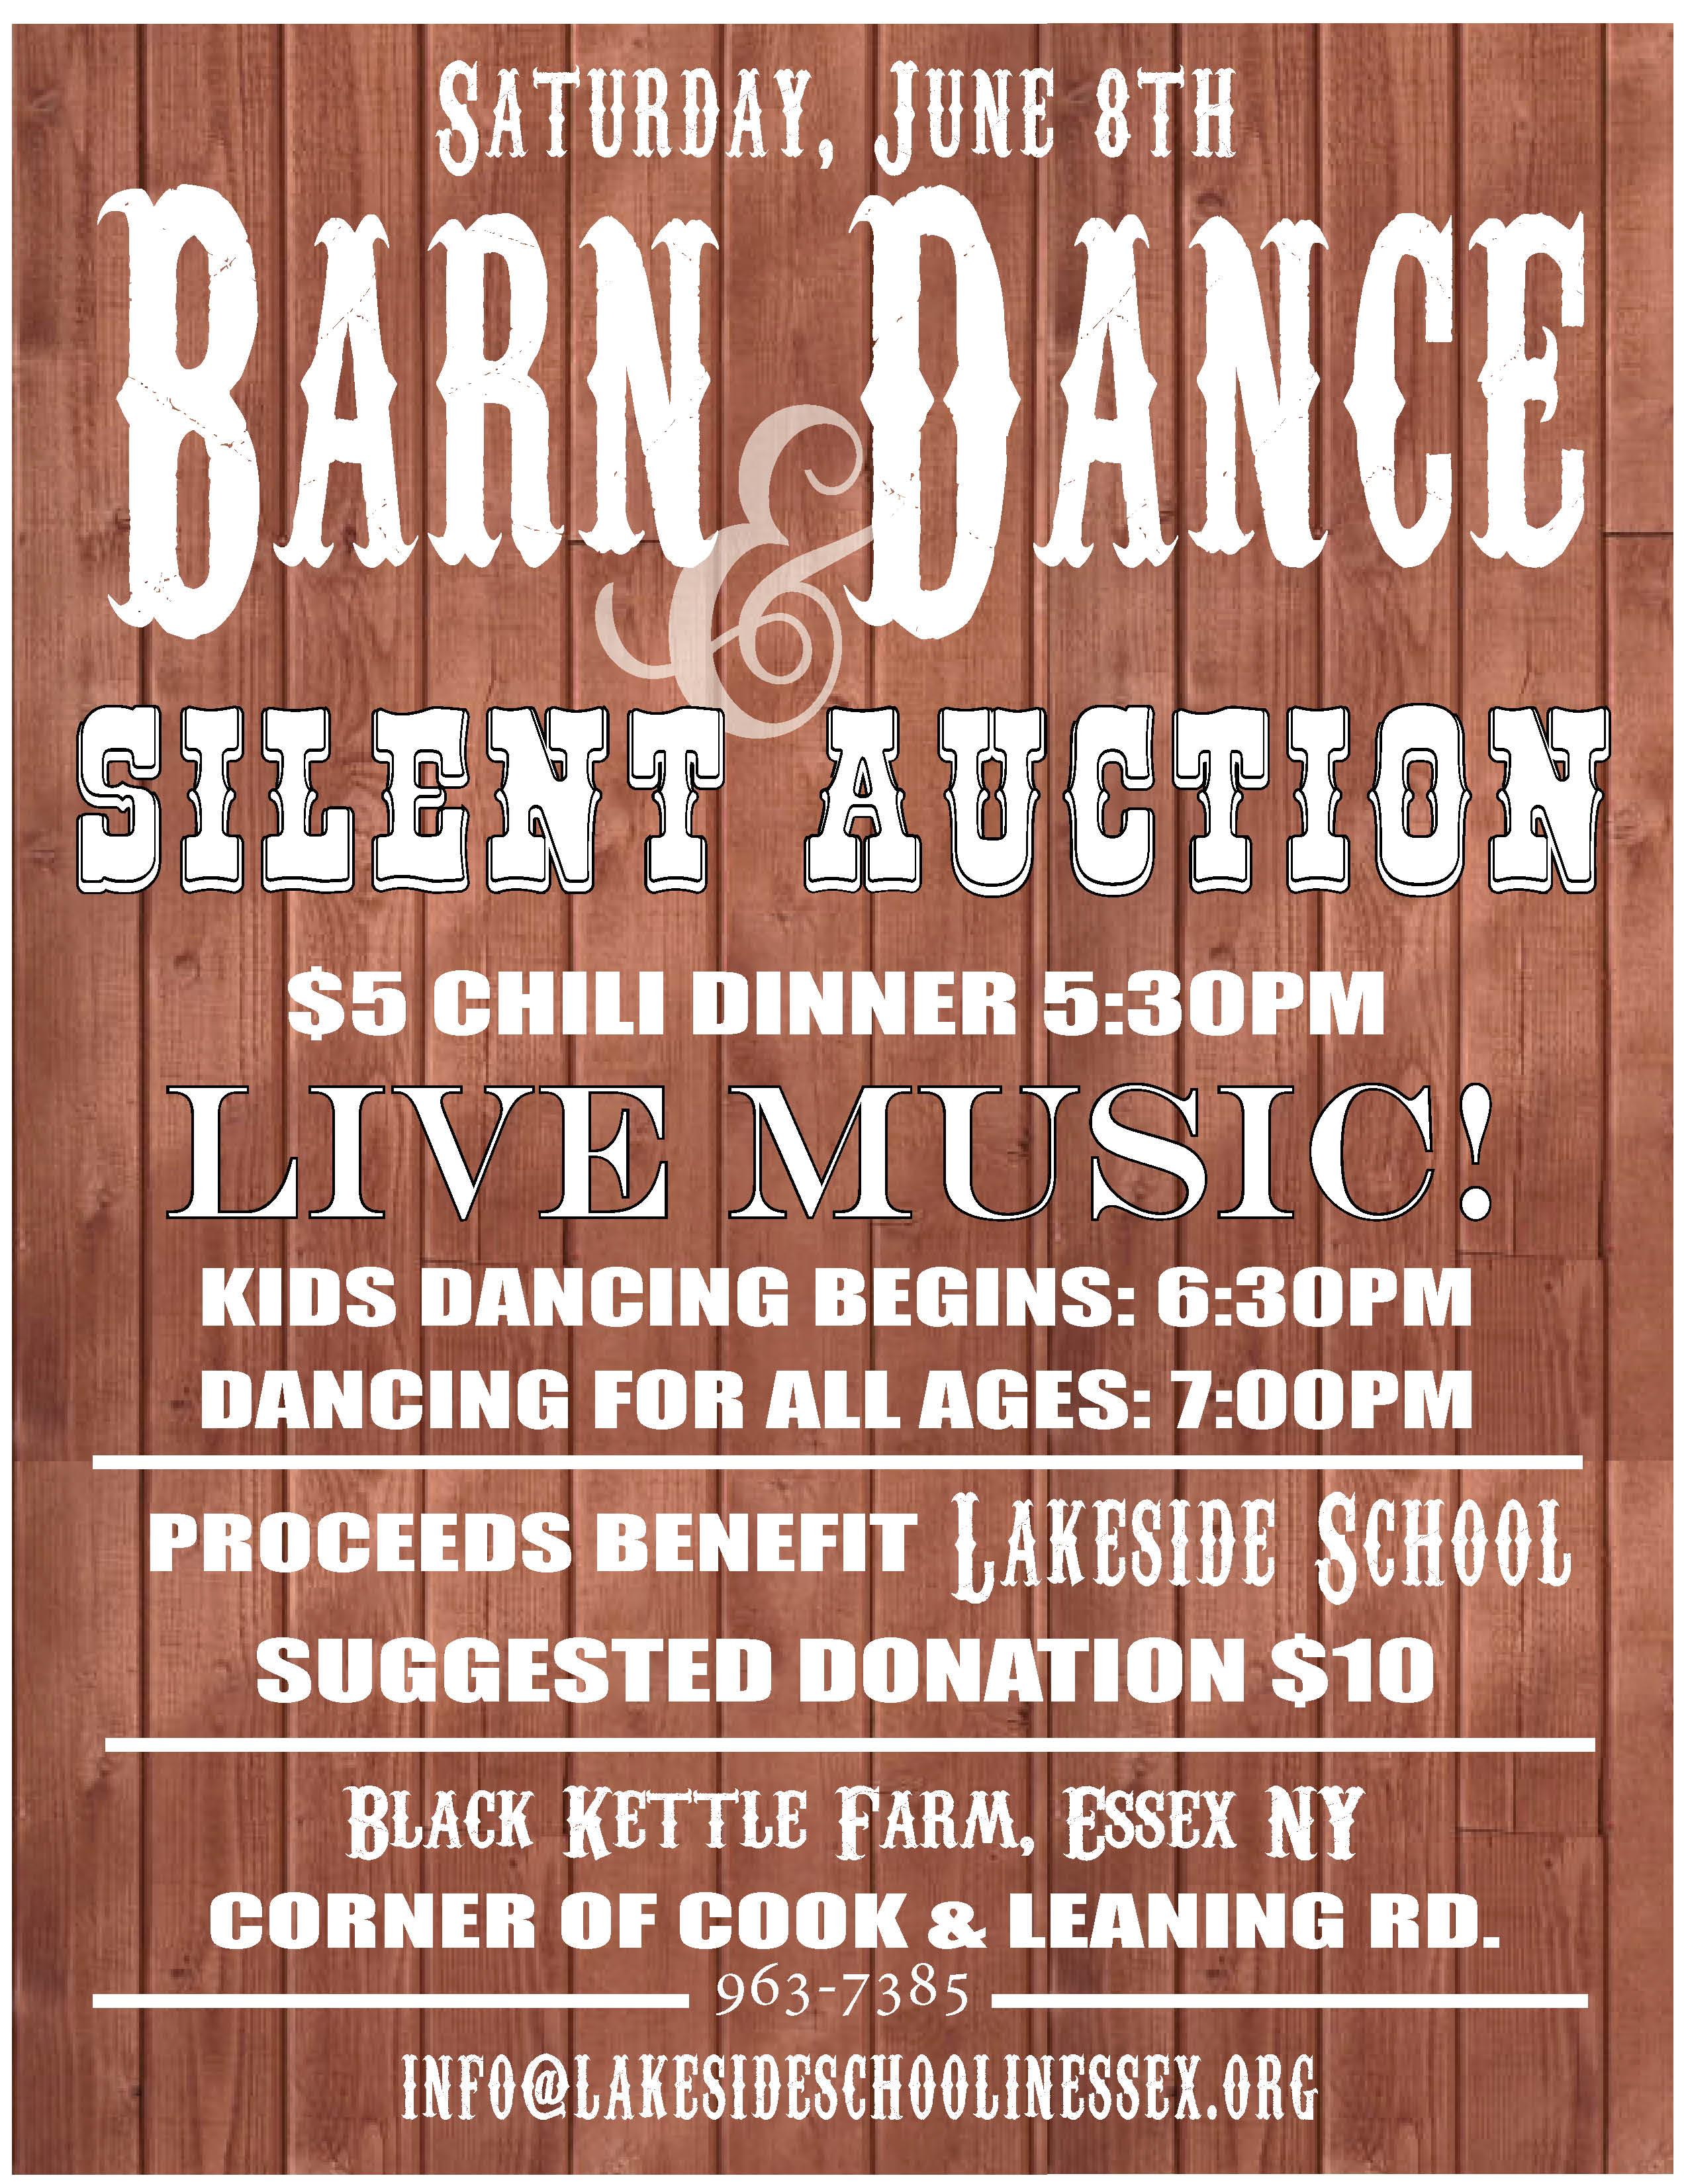 Lakeside School bi-annual barn dance